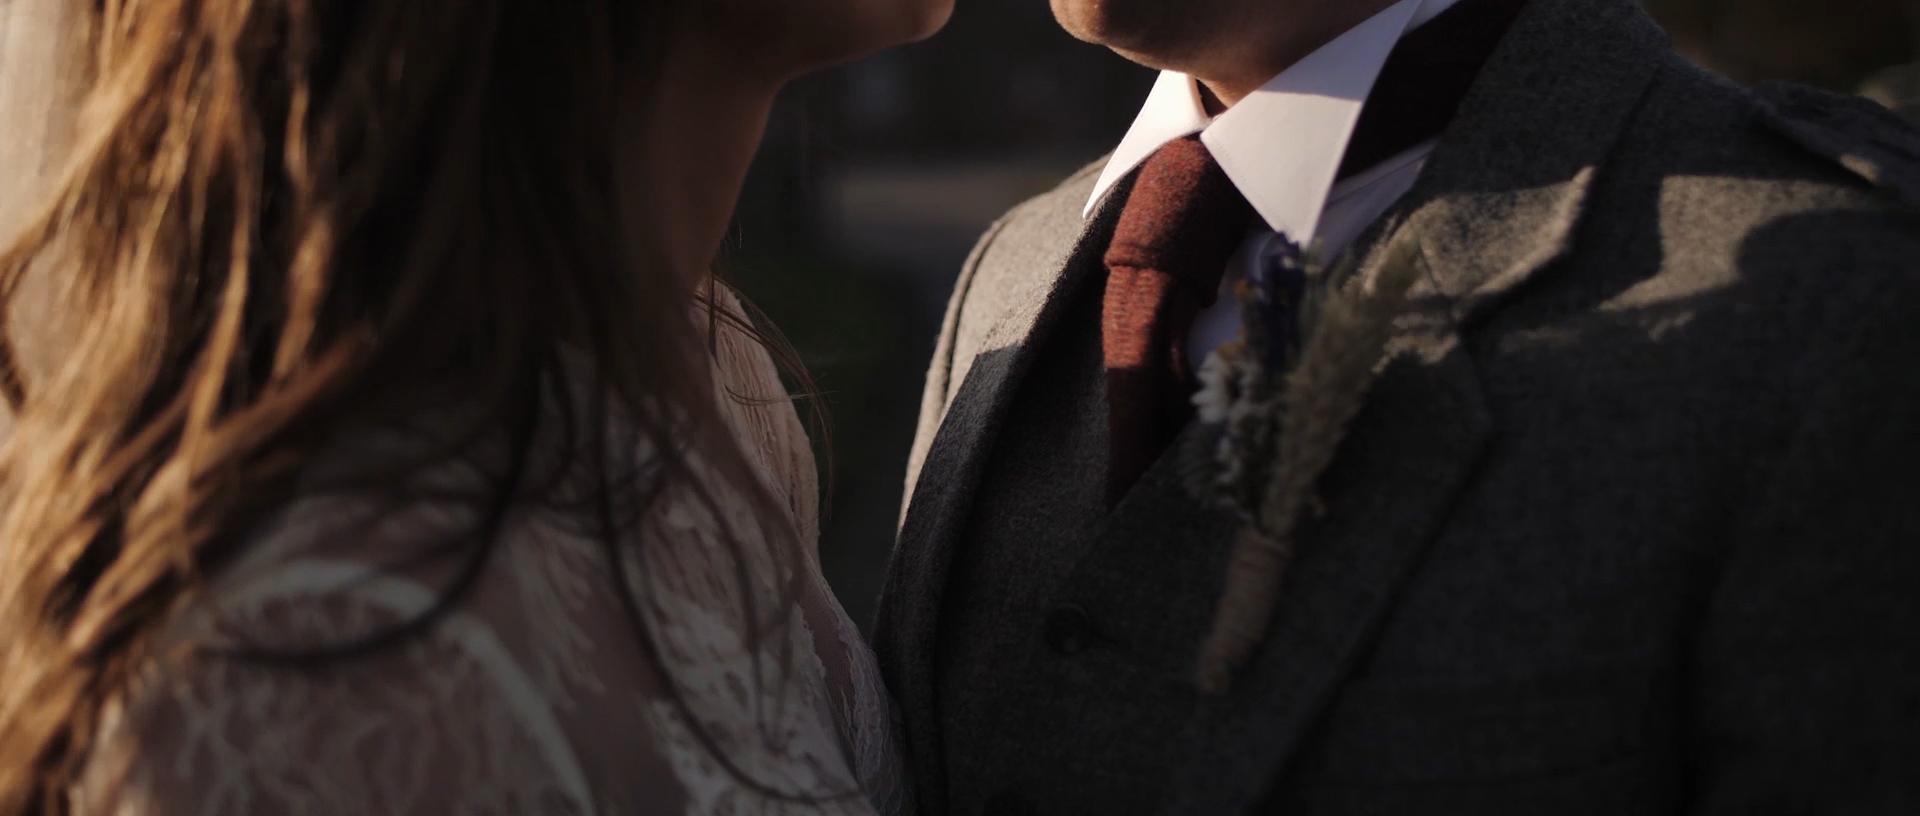 kippilaw-house-wedding-videographer_LL_04.jpg